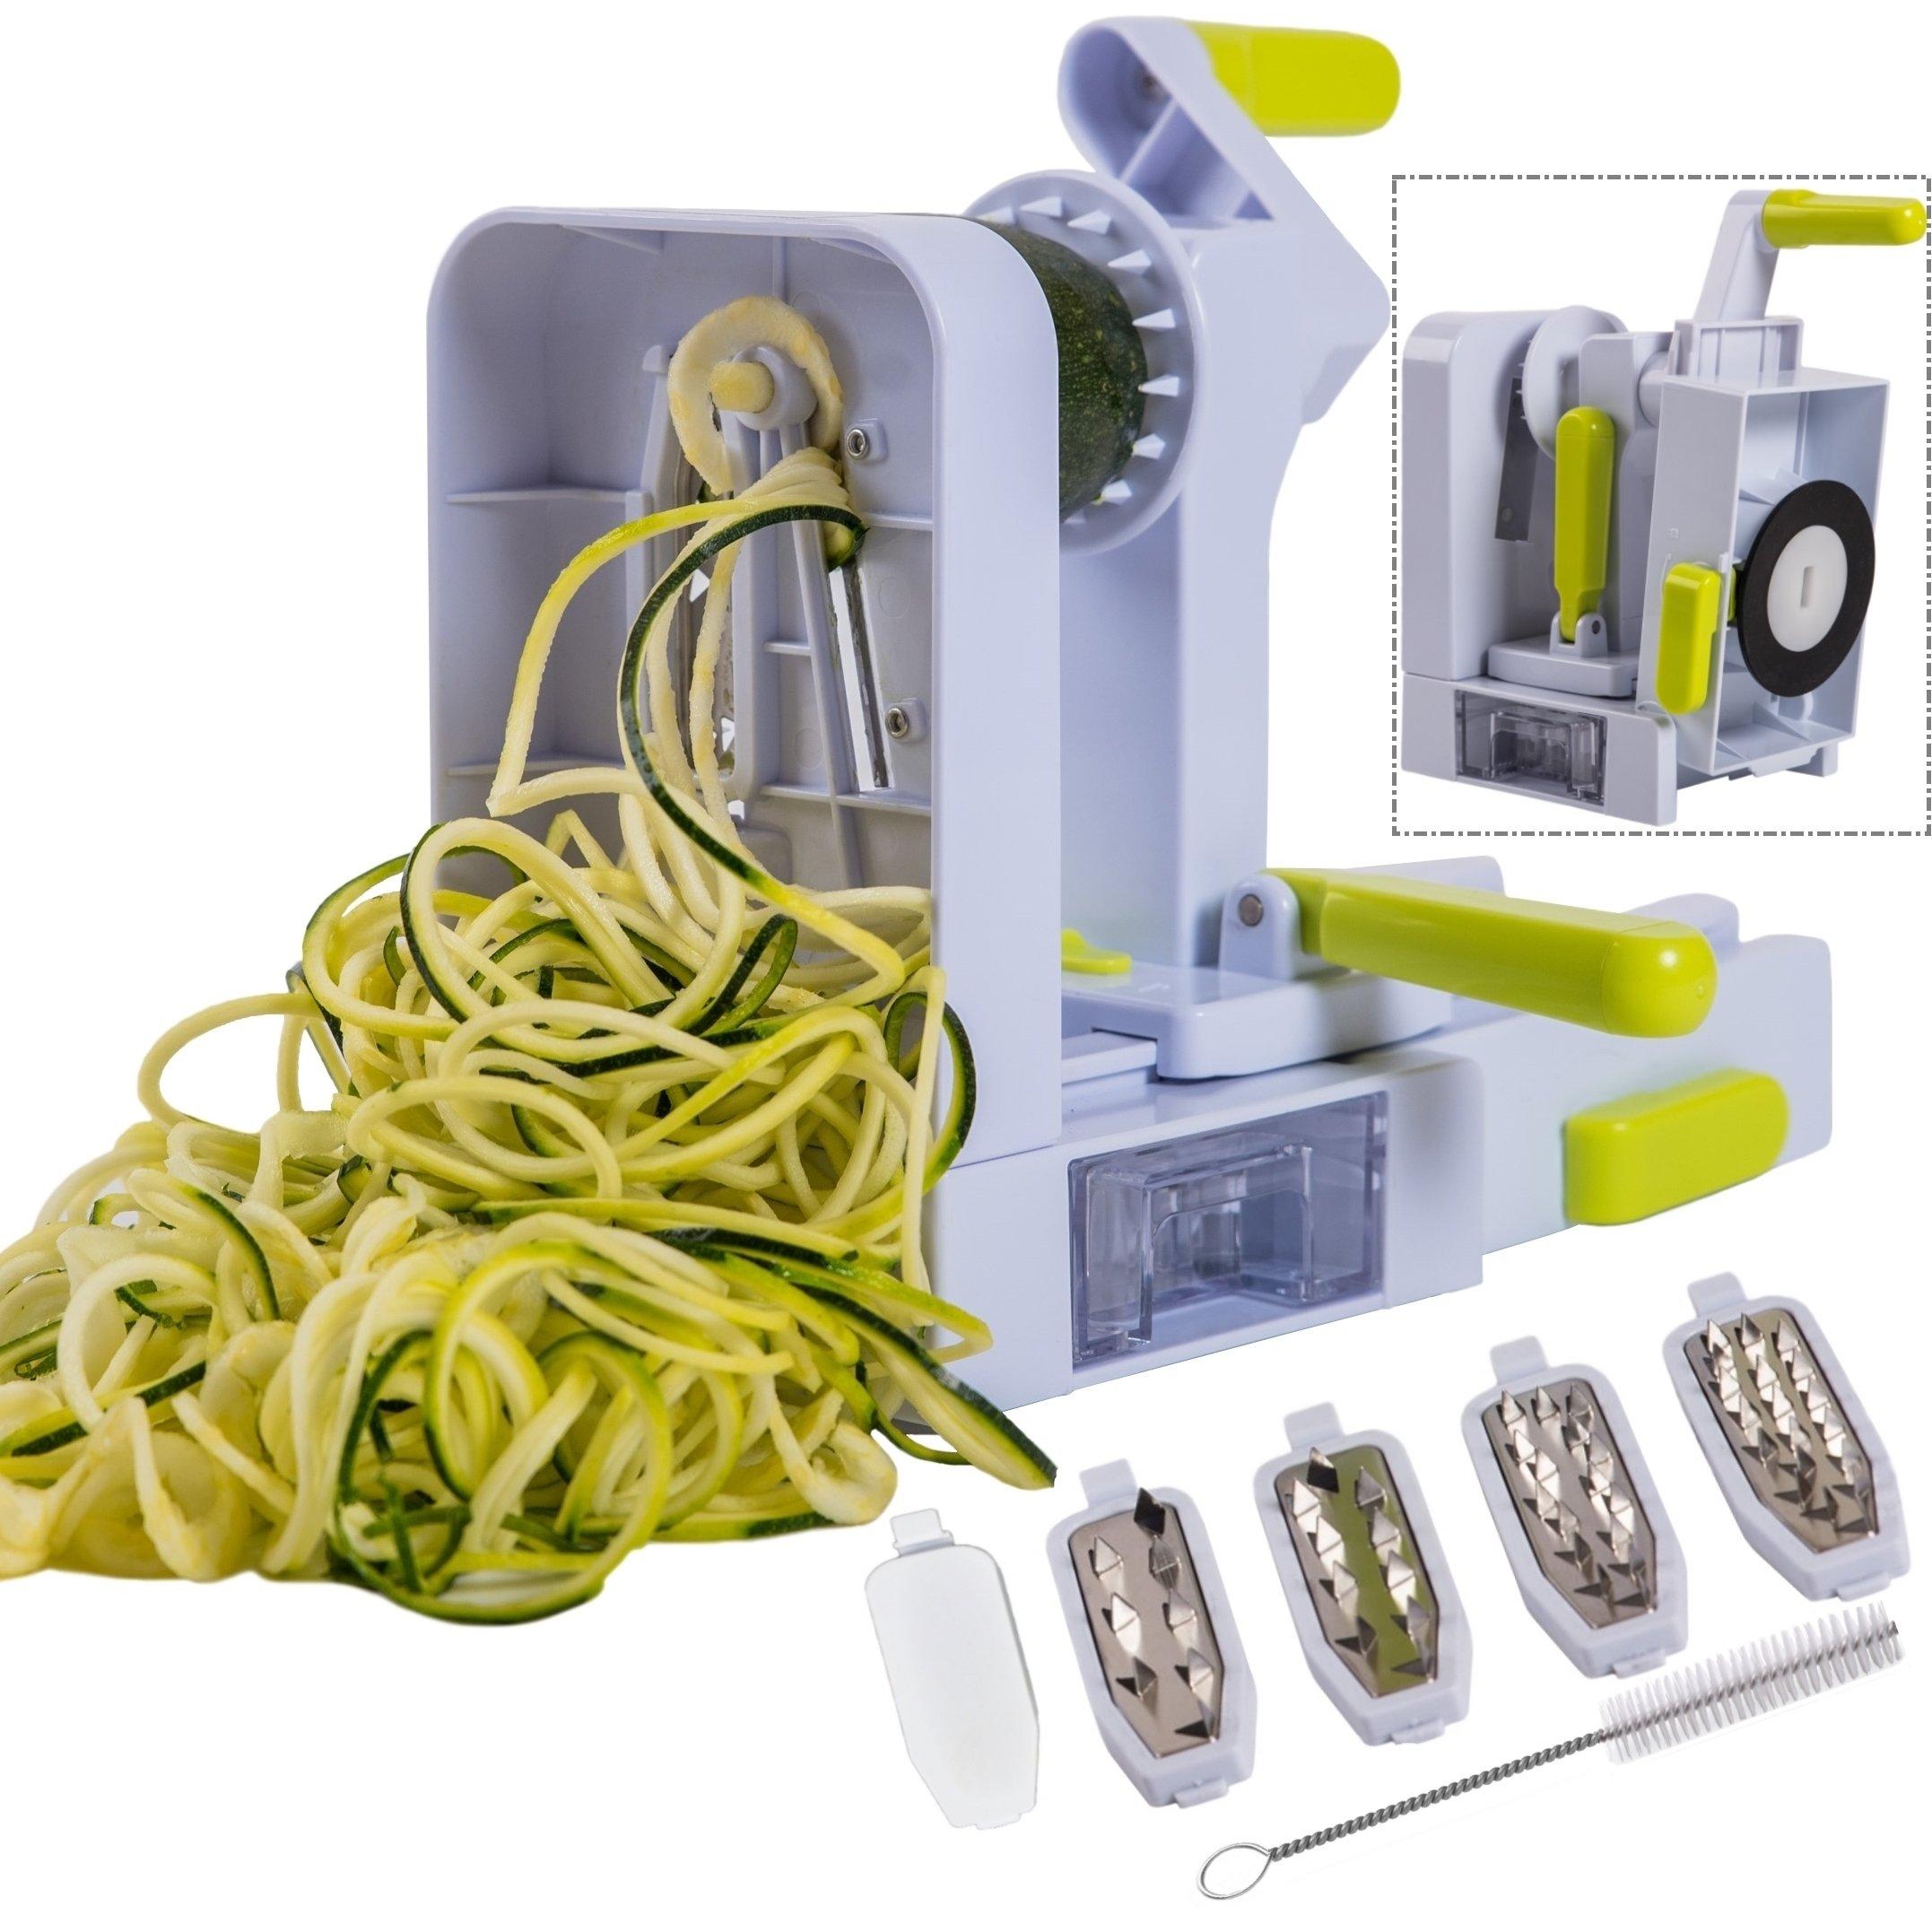 Brieftons QuickFold 5-Blade Spiralizer: 2018 Model, Versatile & Compact Foldable Vegetable Spiral Slicer, Best Veggie Pasta Spaghetti Maker for Low Carb/Paleo/Gluten-Free with Brush & 4 Recipe Ebooks